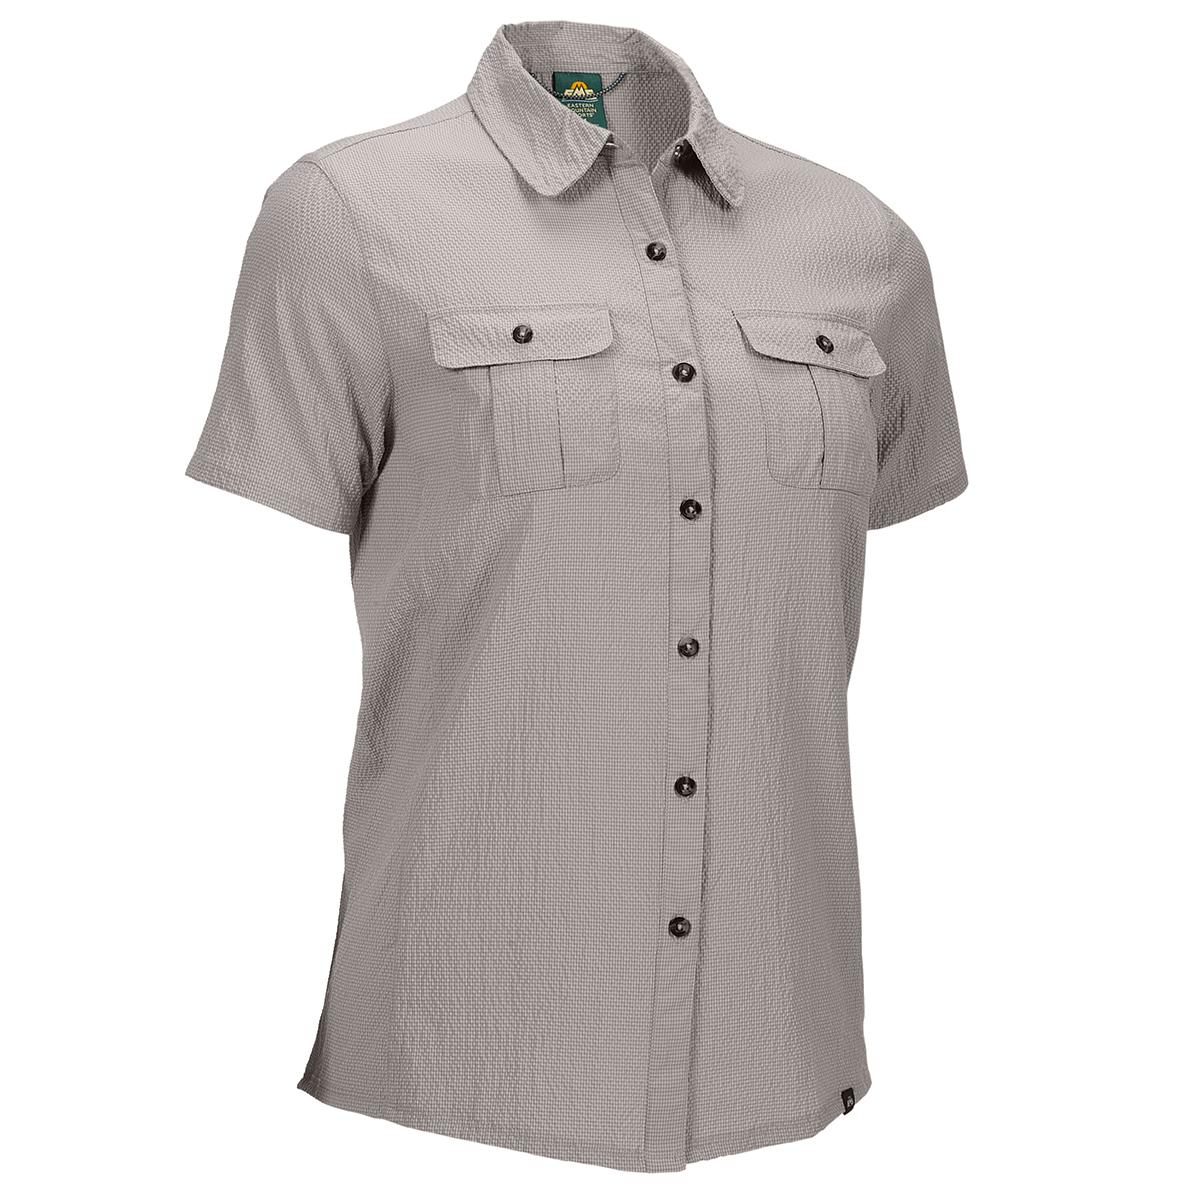 Ems Women's Bonus Miles Short-Sleeve Shirt - Brown, XS